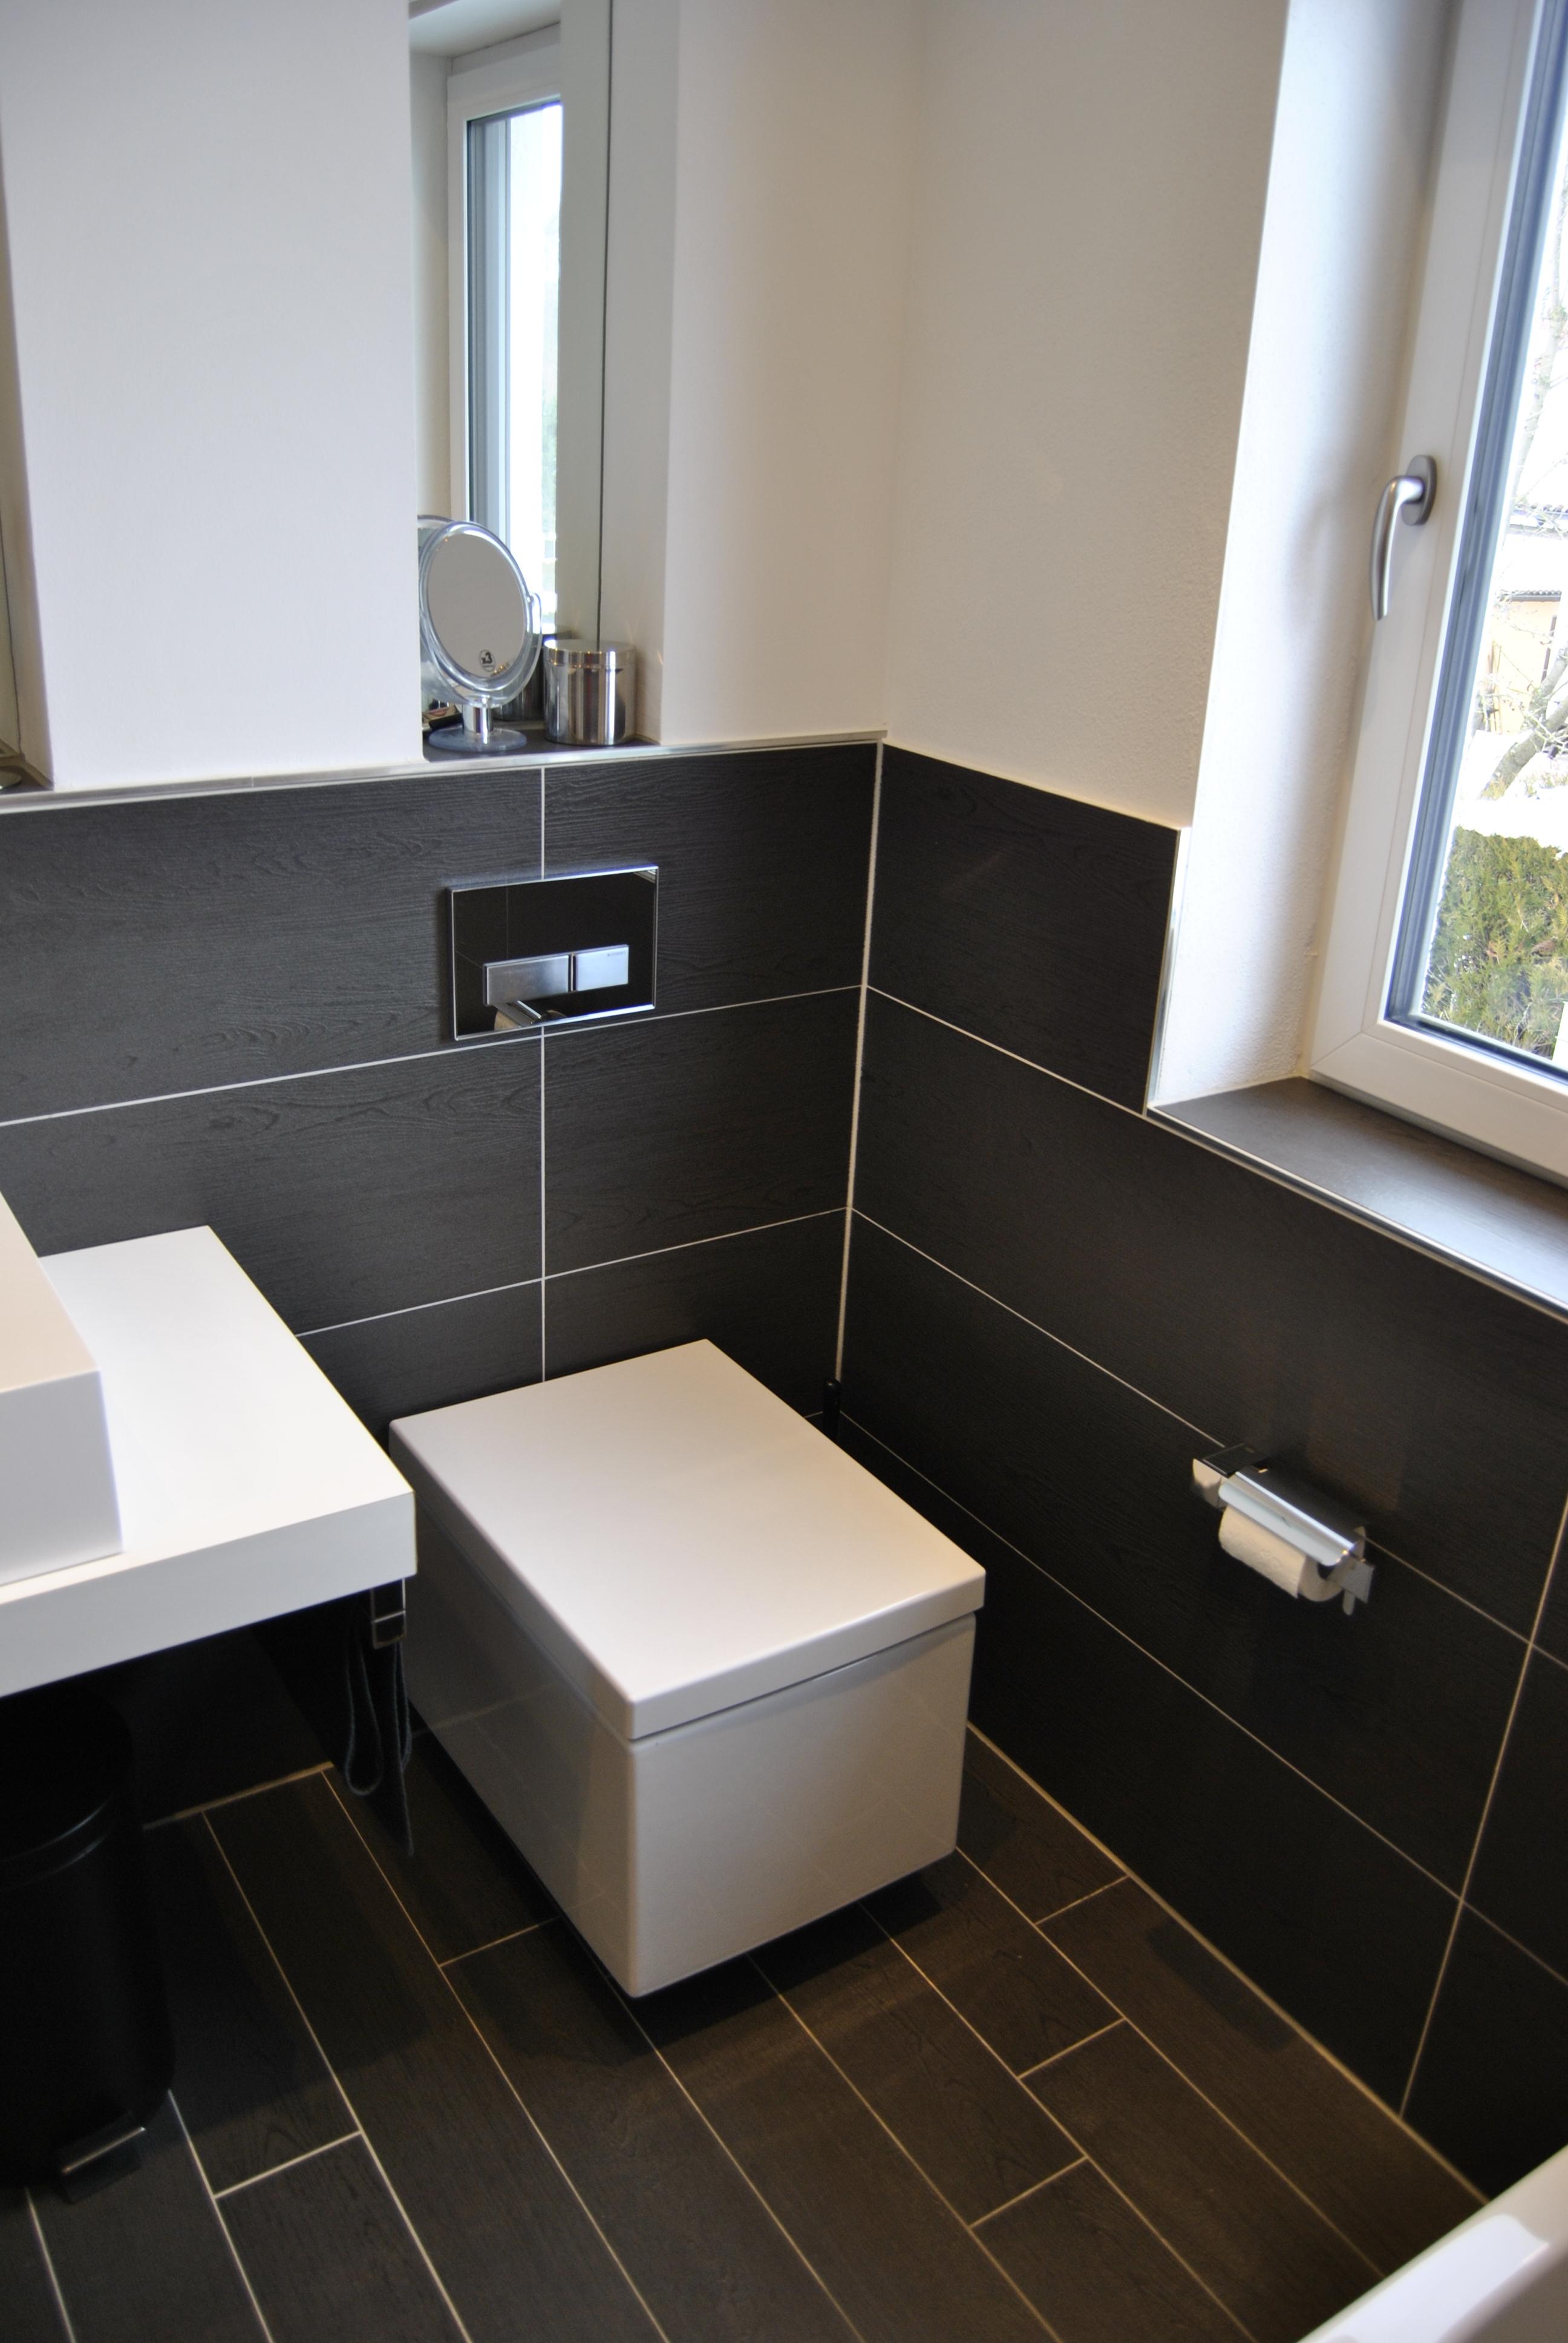 galerie fliesenverlegung graupner. Black Bedroom Furniture Sets. Home Design Ideas